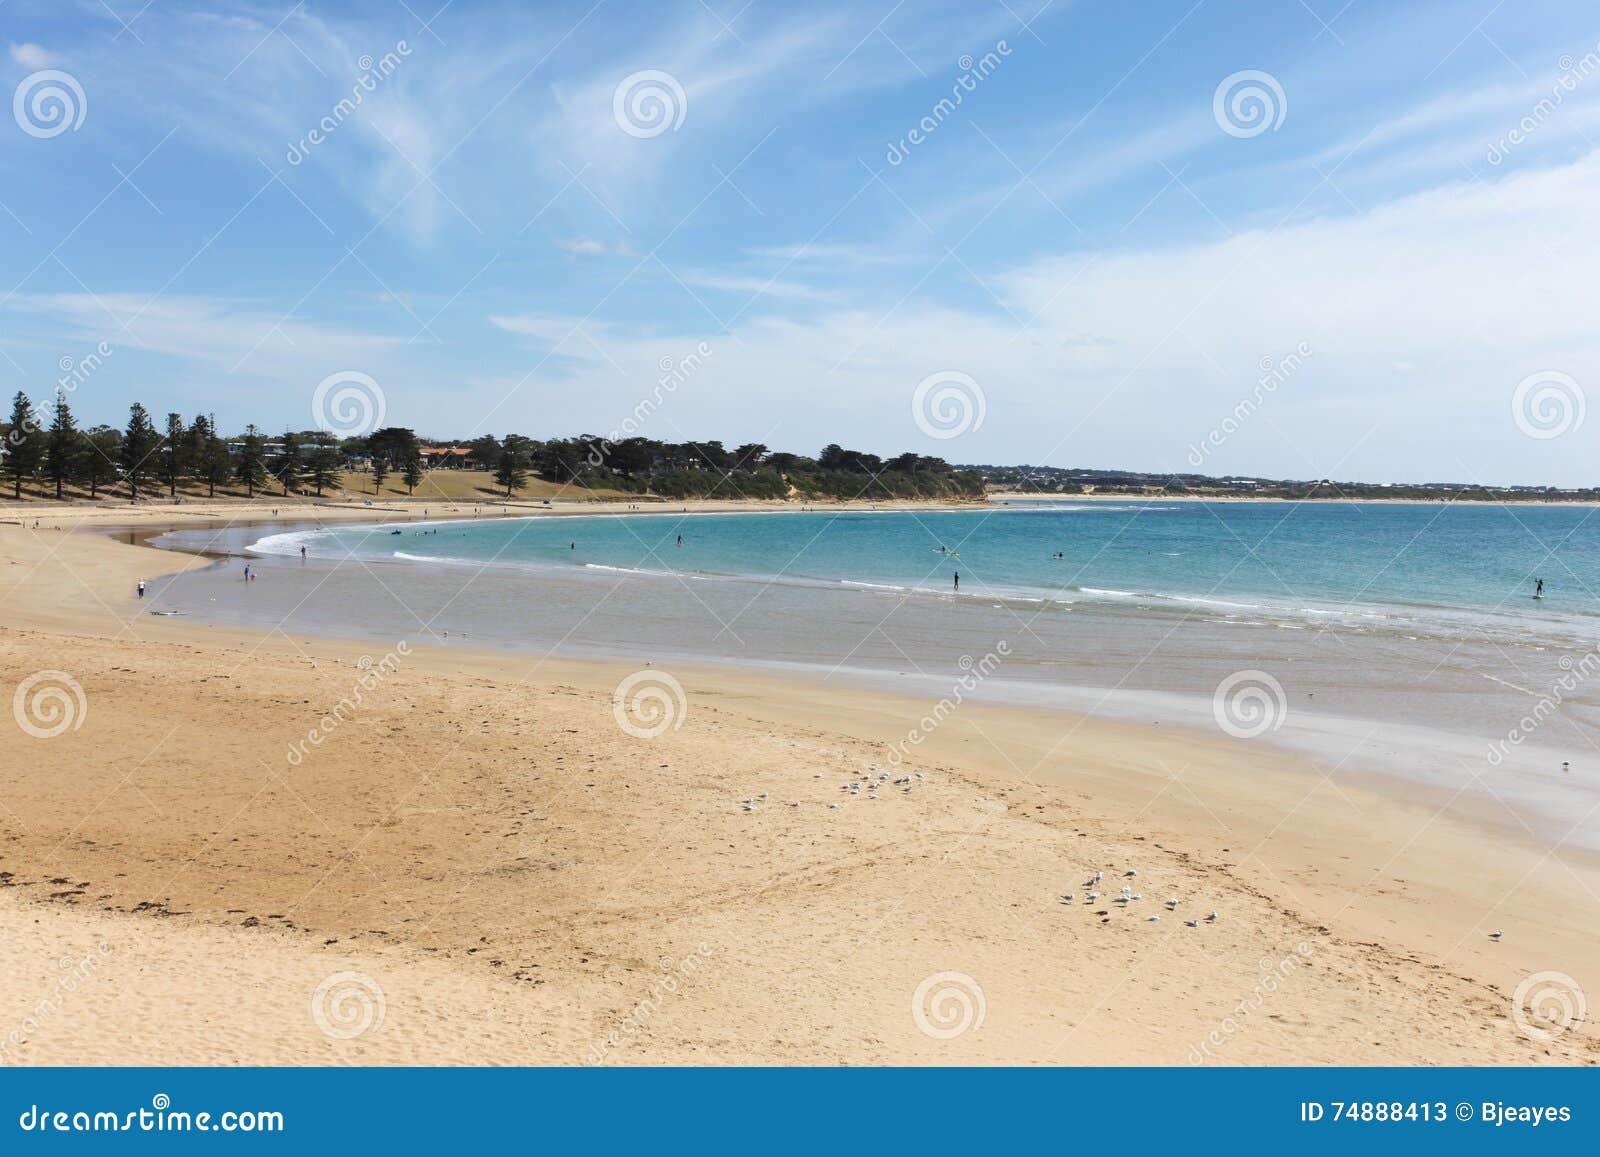 Praia principal de Torquay - Torquay Victoria Australia